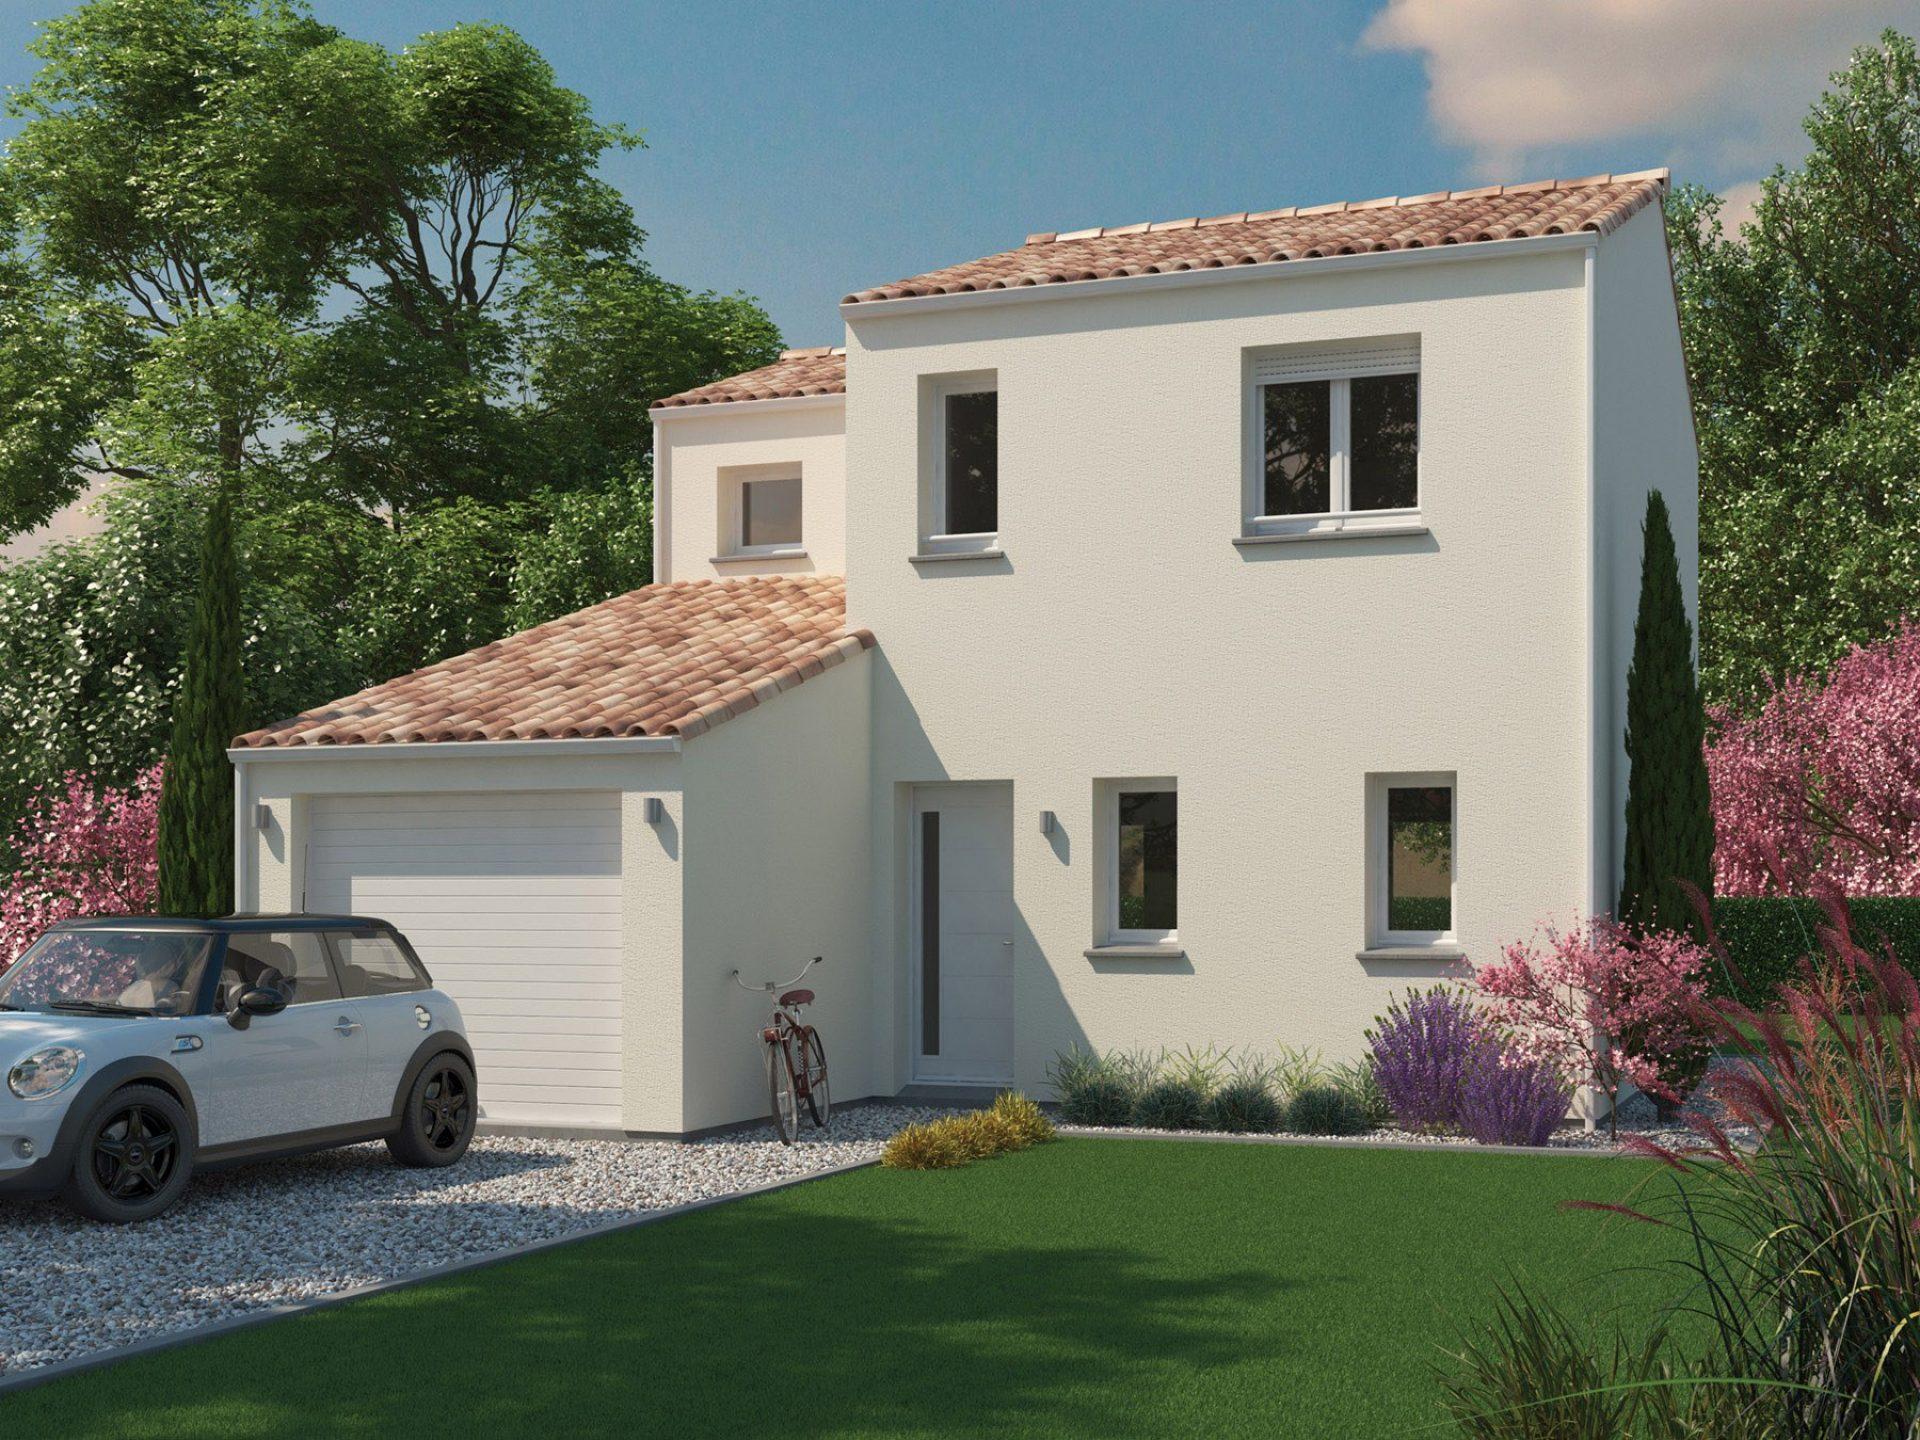 La maison Citadine Investisseur | 90 m² | 3 chambres